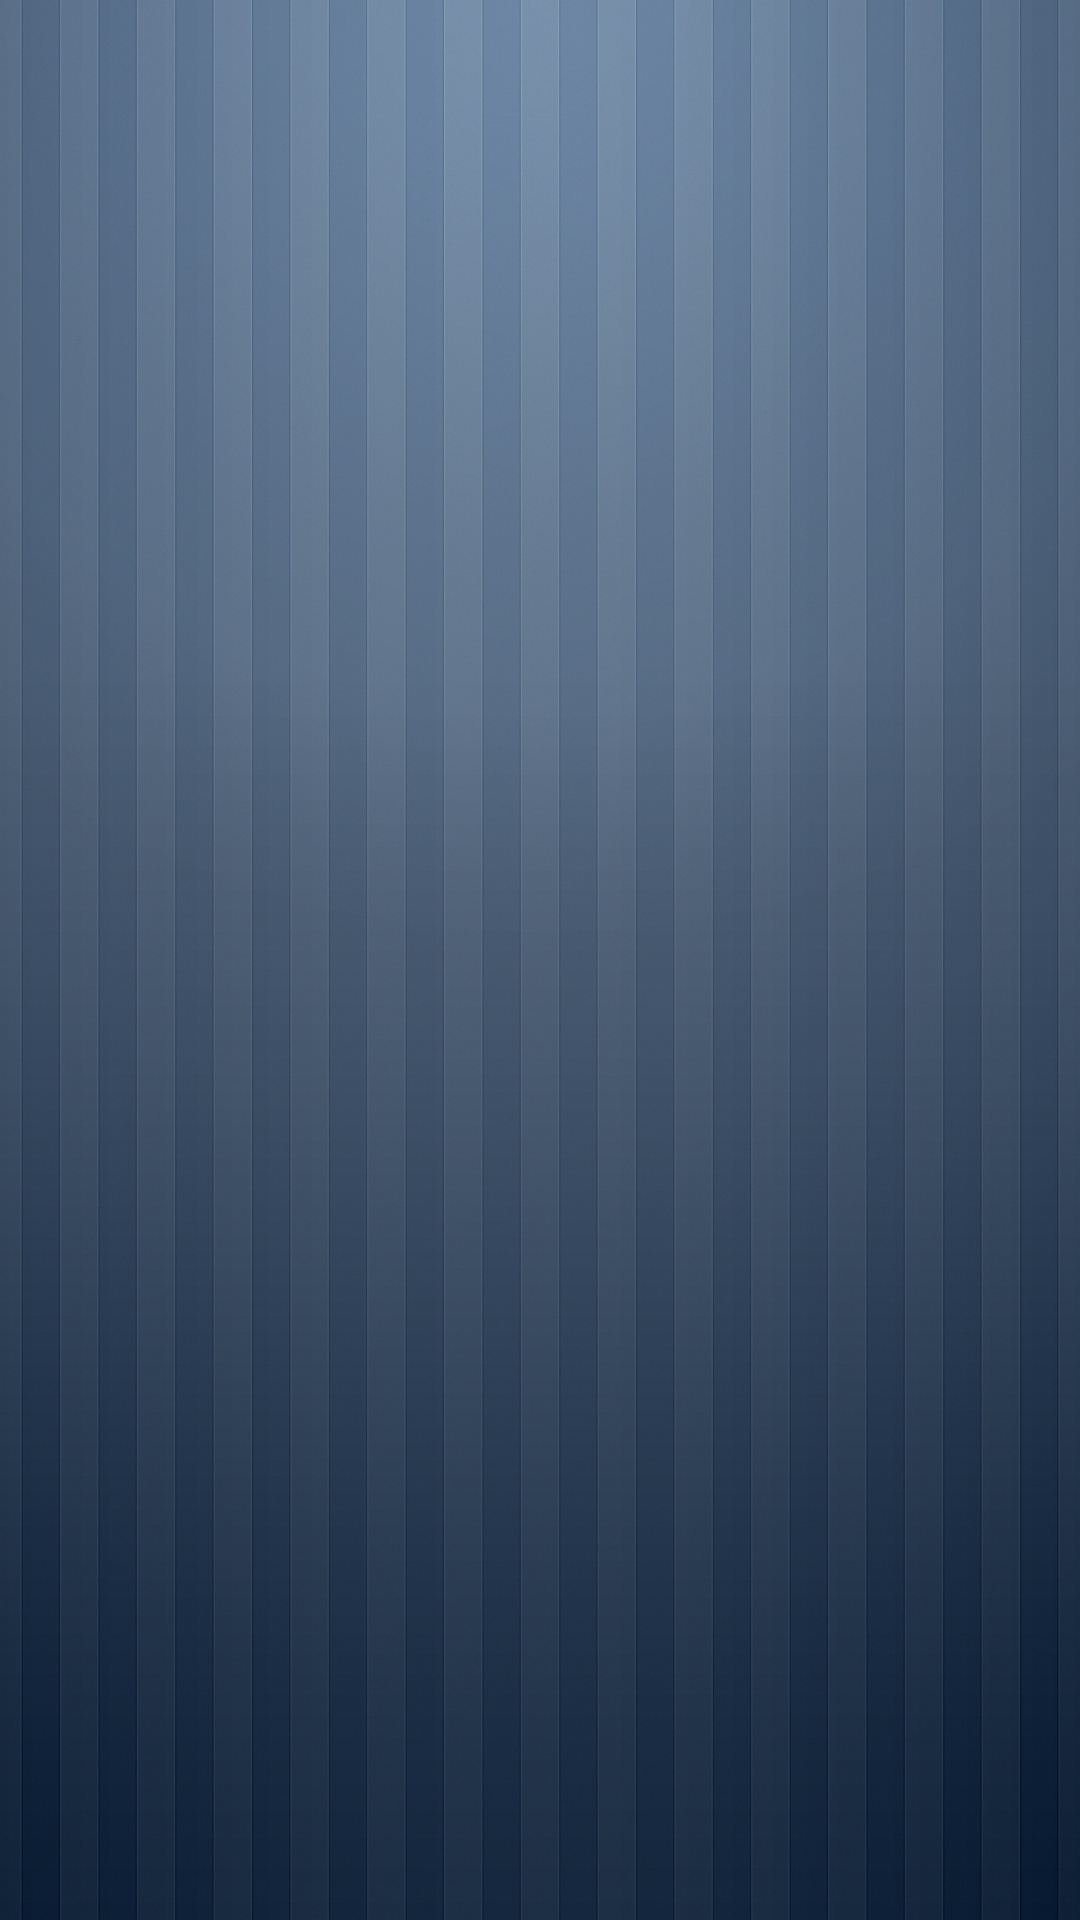 Download 1080x1920 Blue, Stripes, Vertical, Dark Wallpaper, Background ...